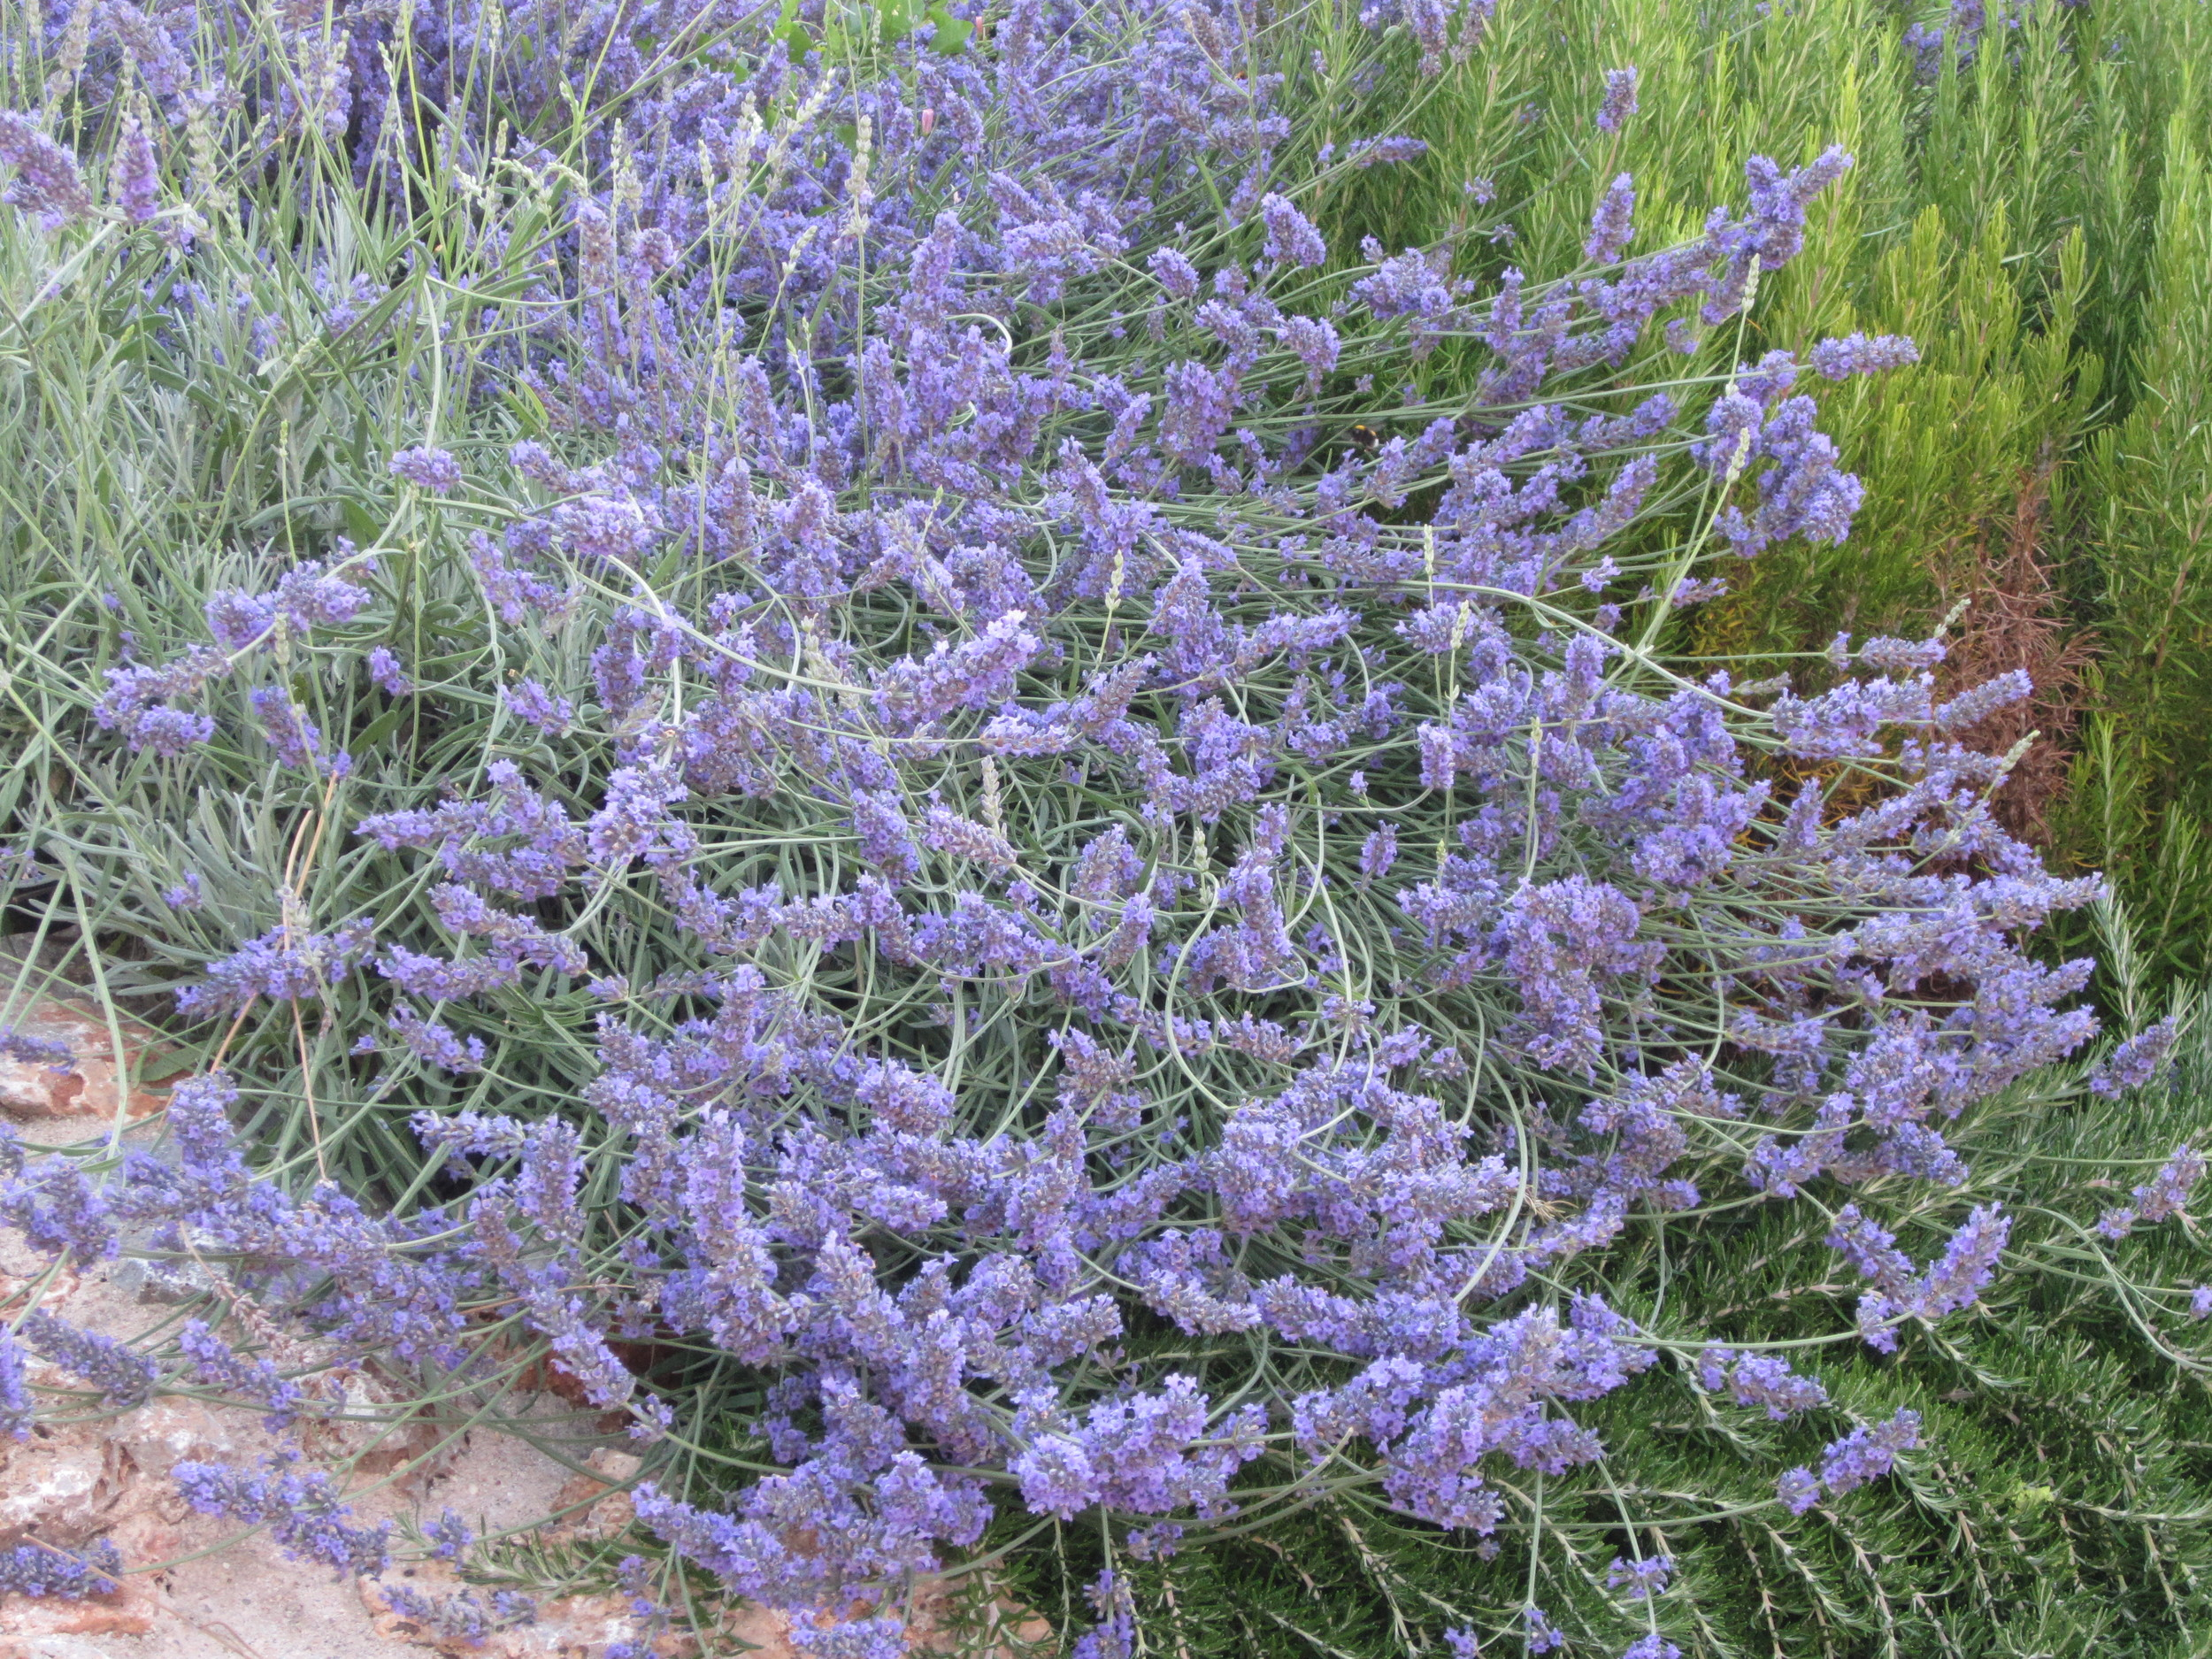 Lavender in Tuscany